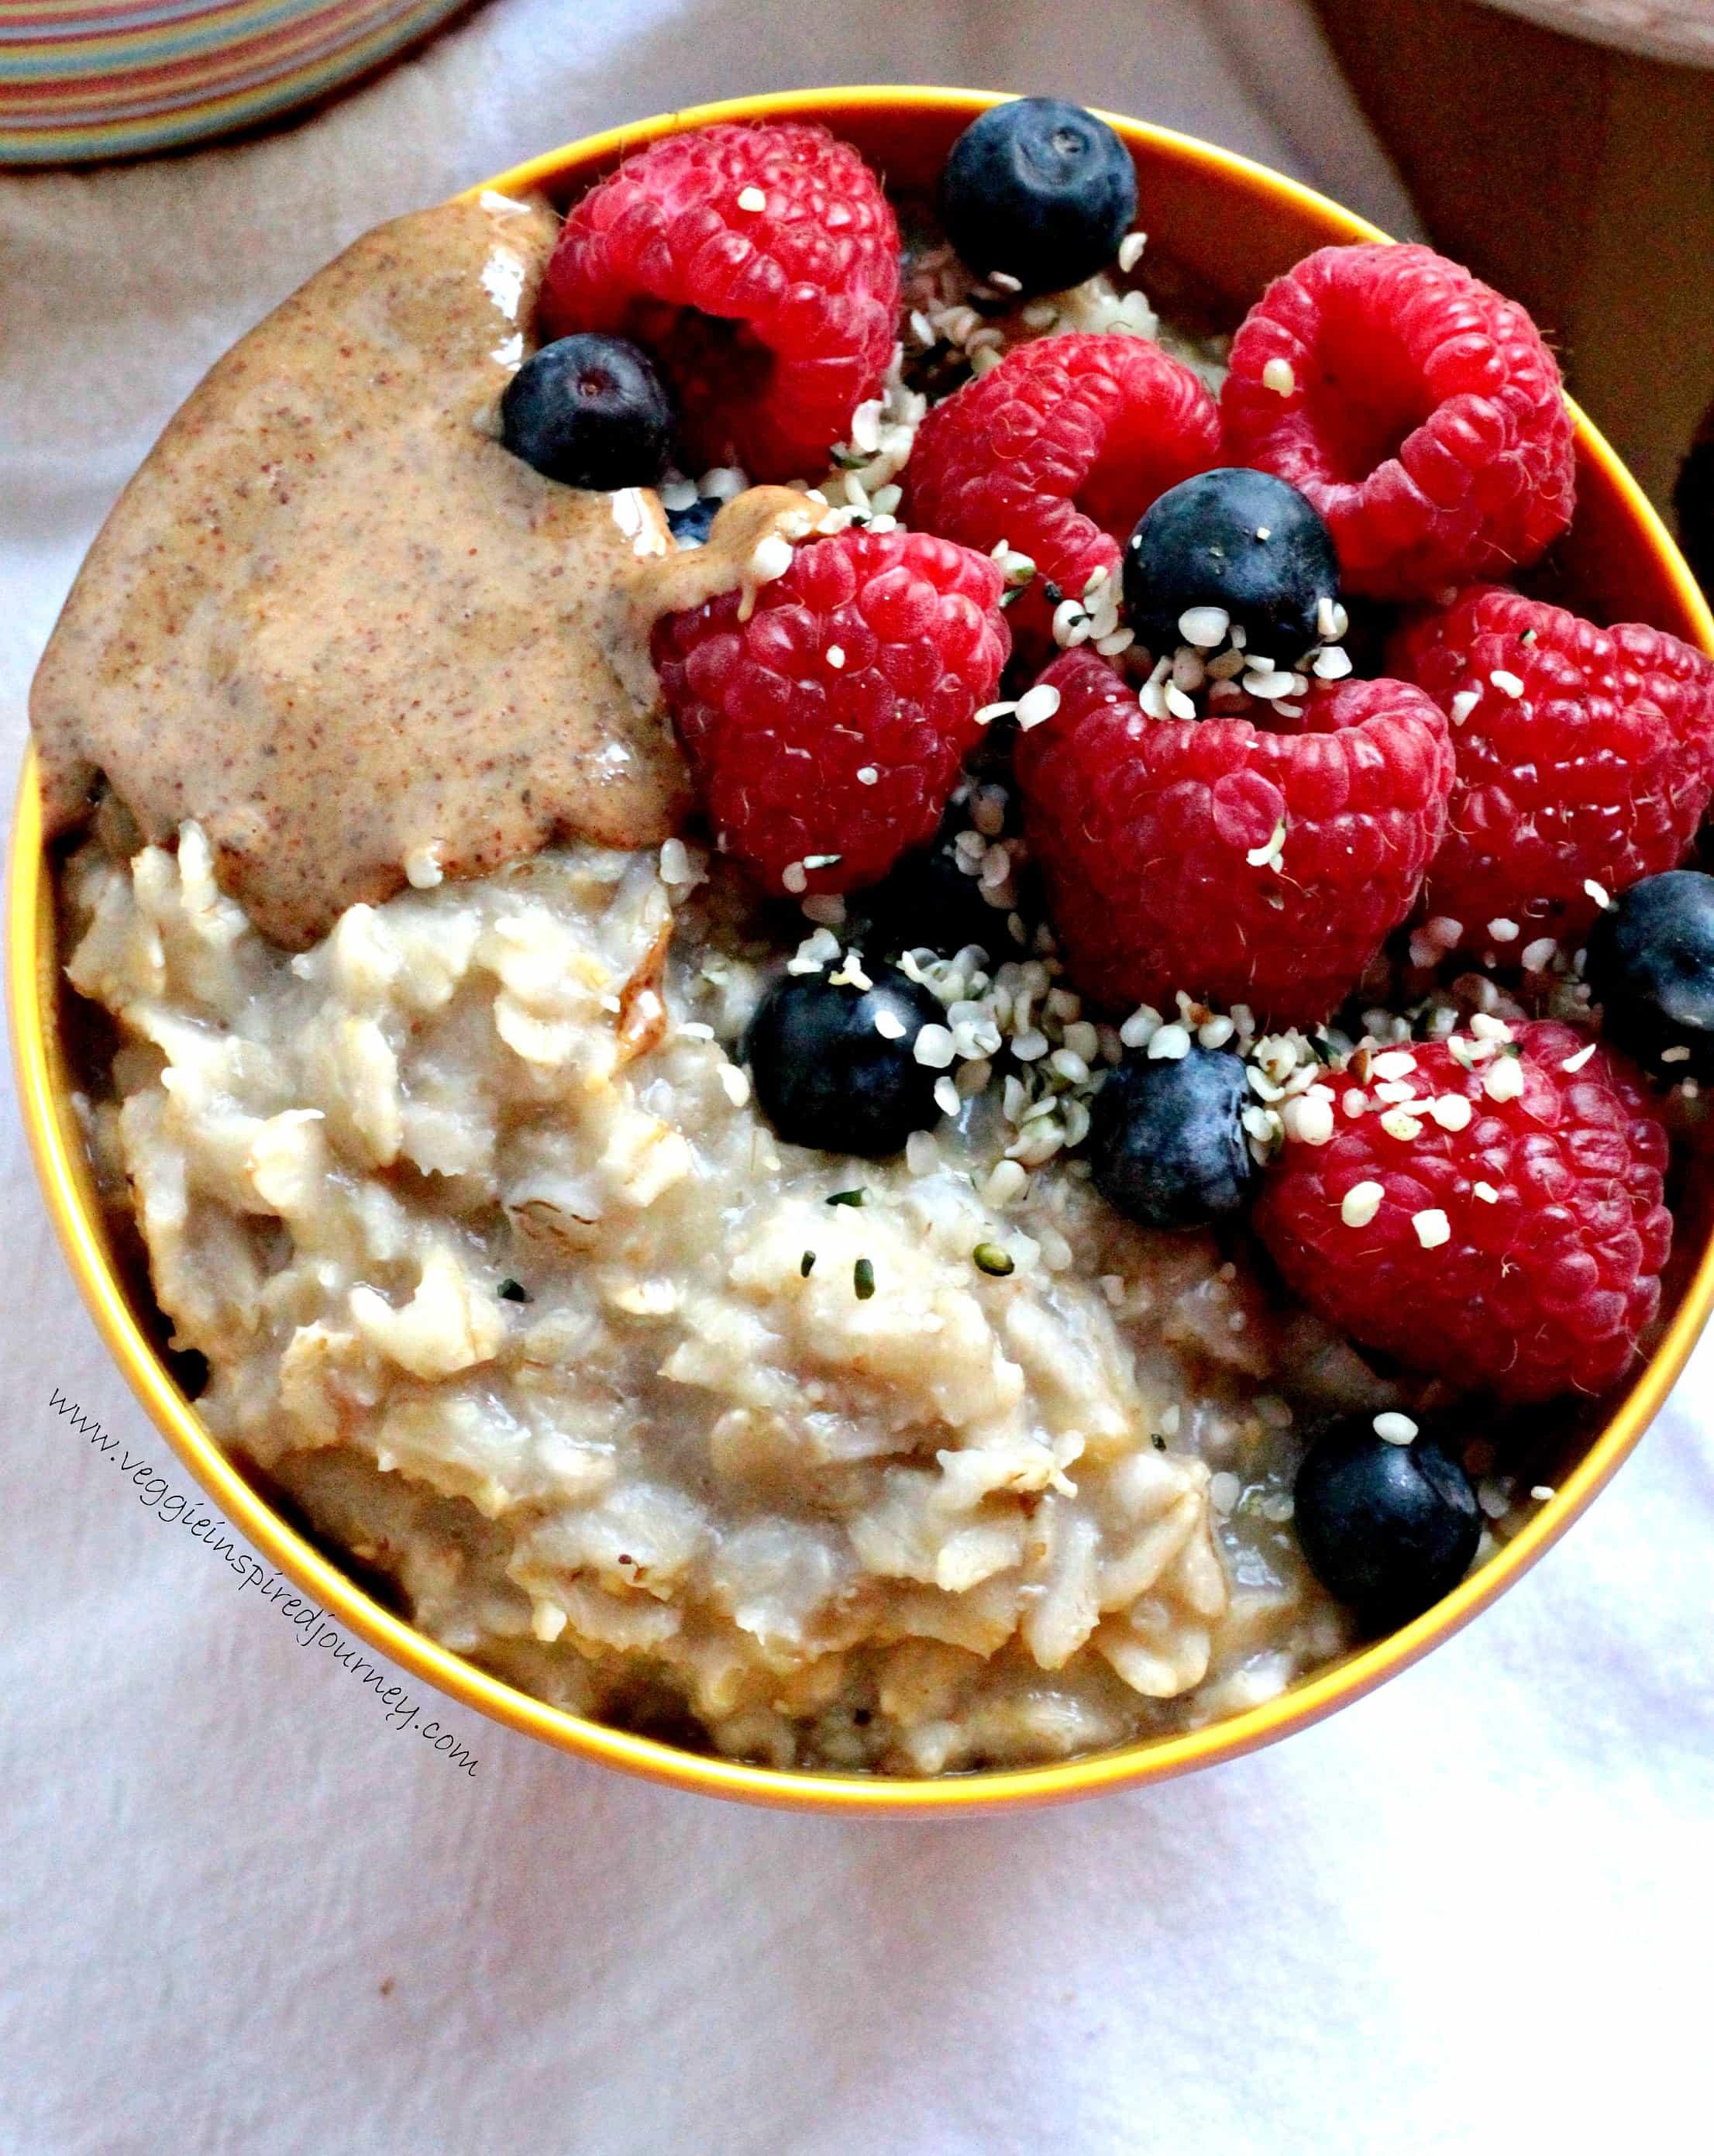 Healthy Oatmeal Breakfast Recipes  Easy Sweet Creamy Customizable Healthy Oatmeal